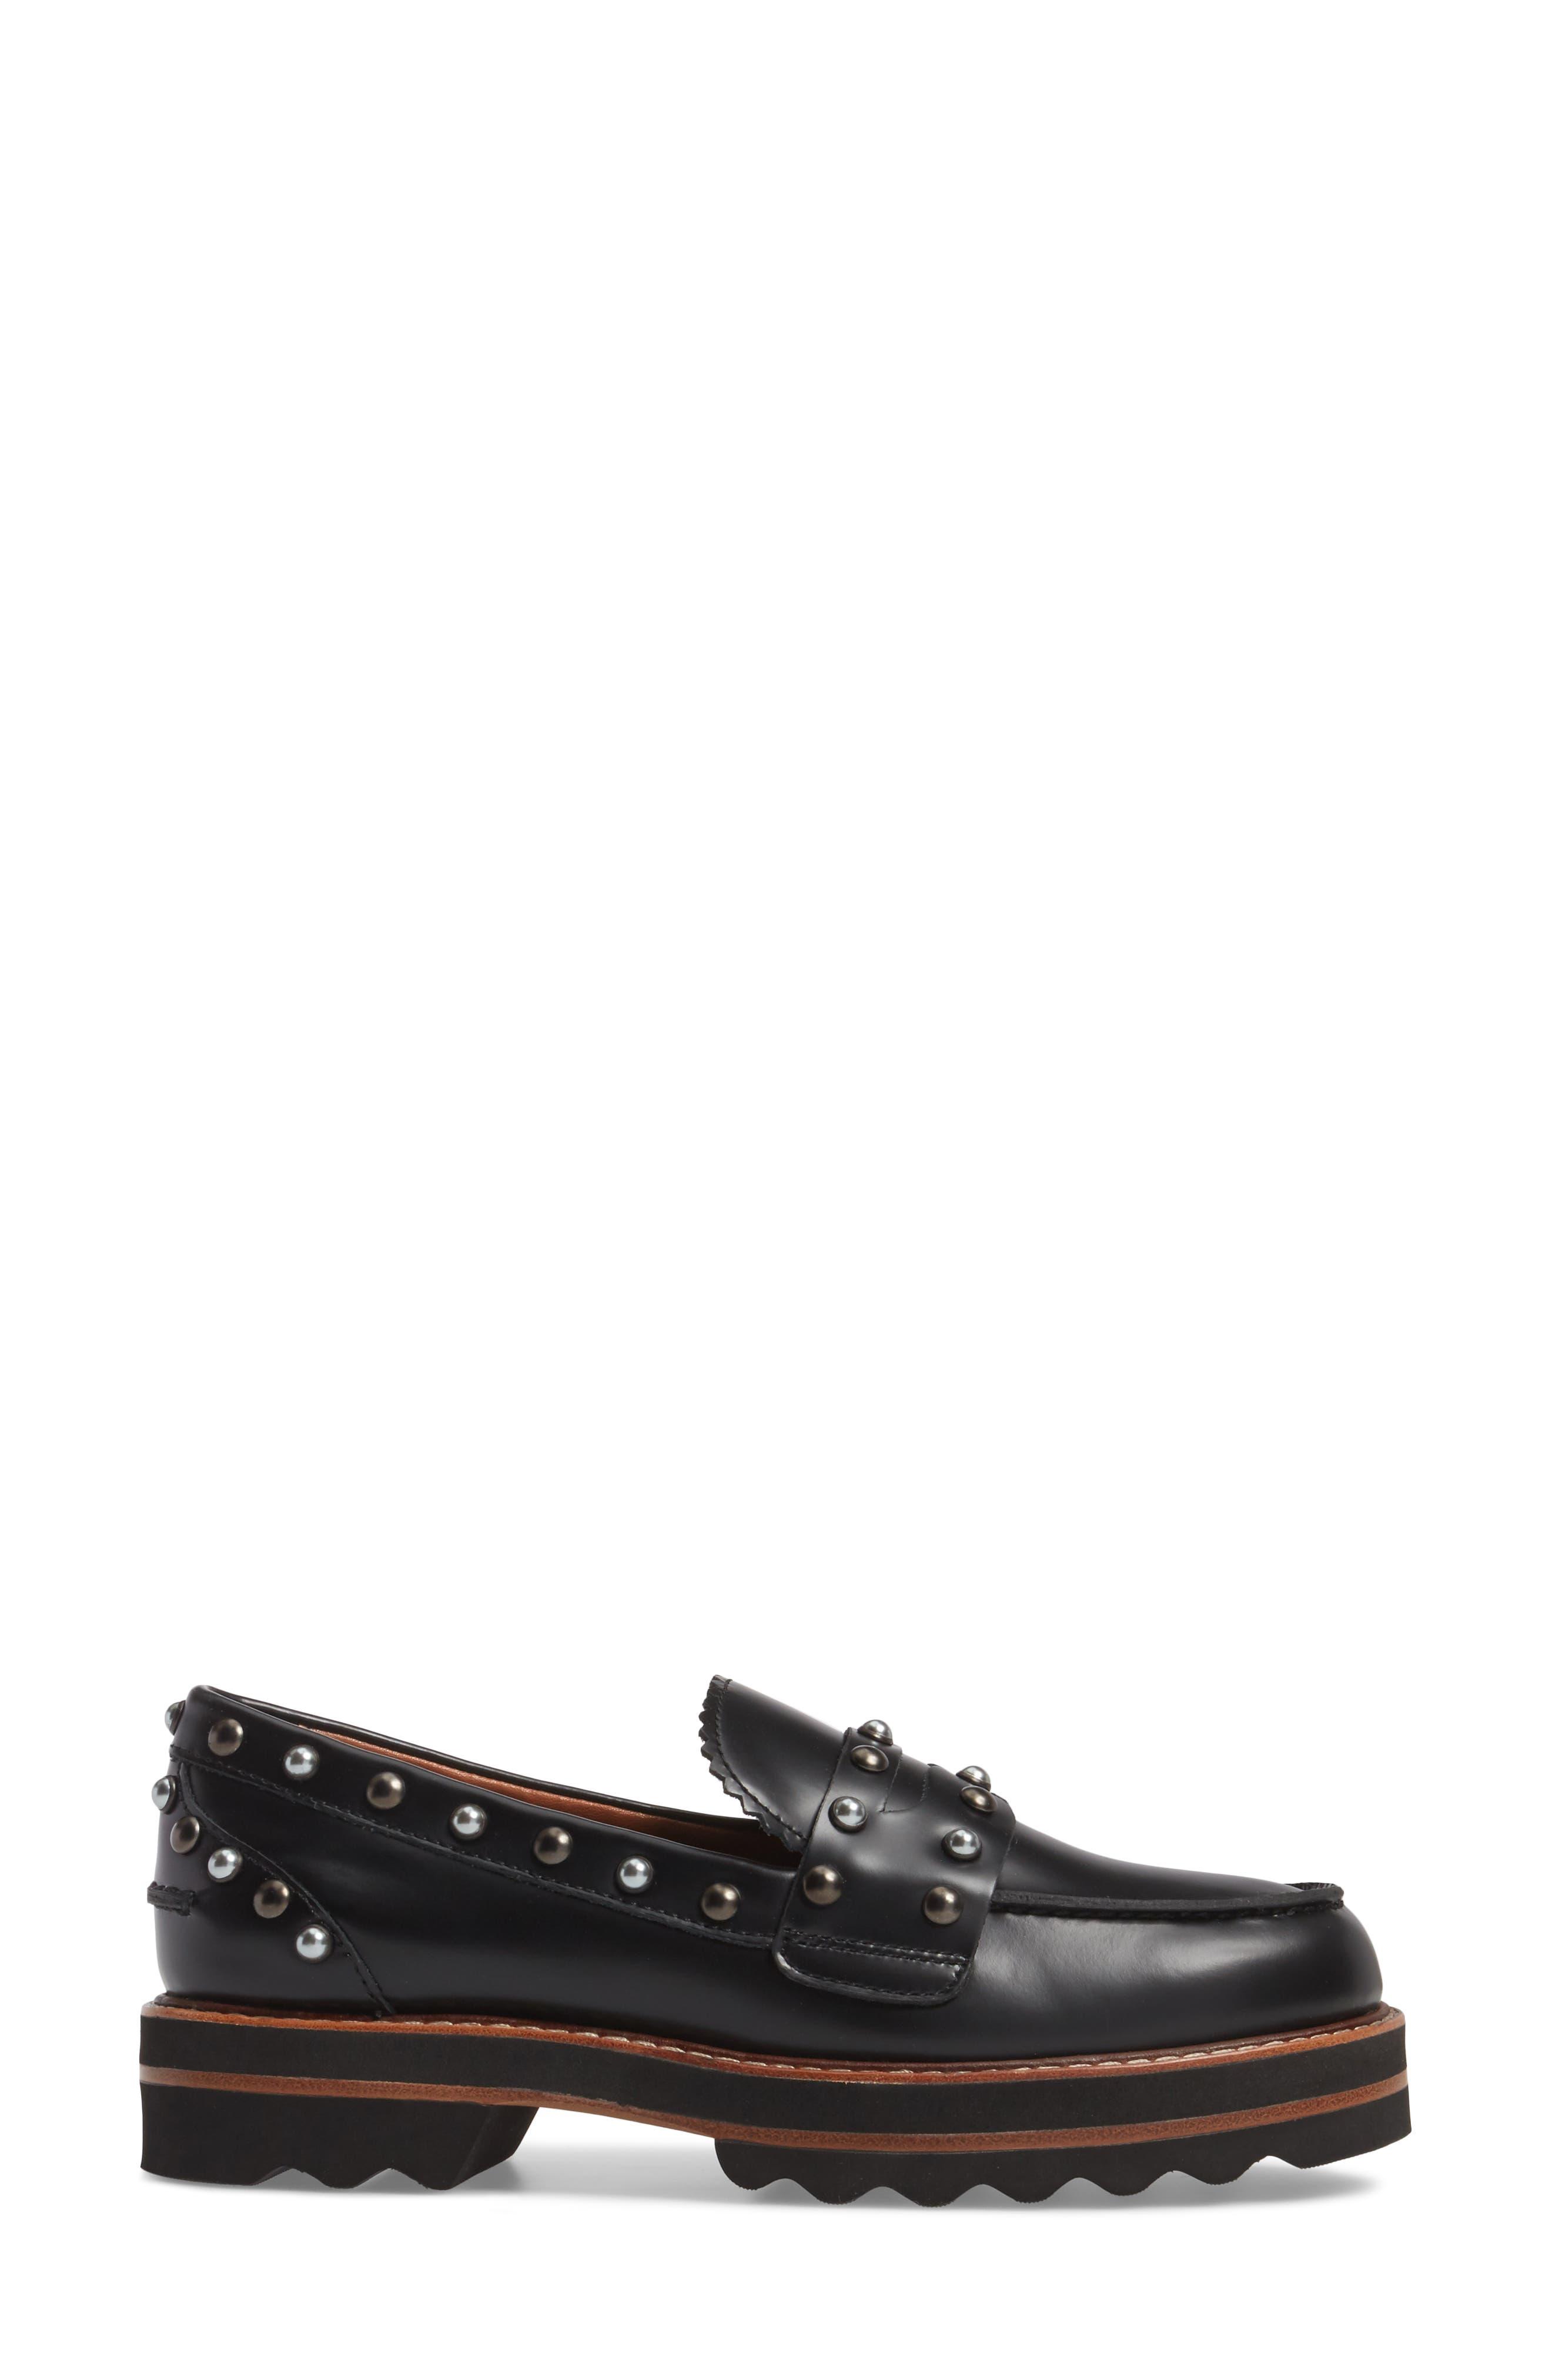 Lenox Loafer,                             Alternate thumbnail 3, color,                             Black Leather